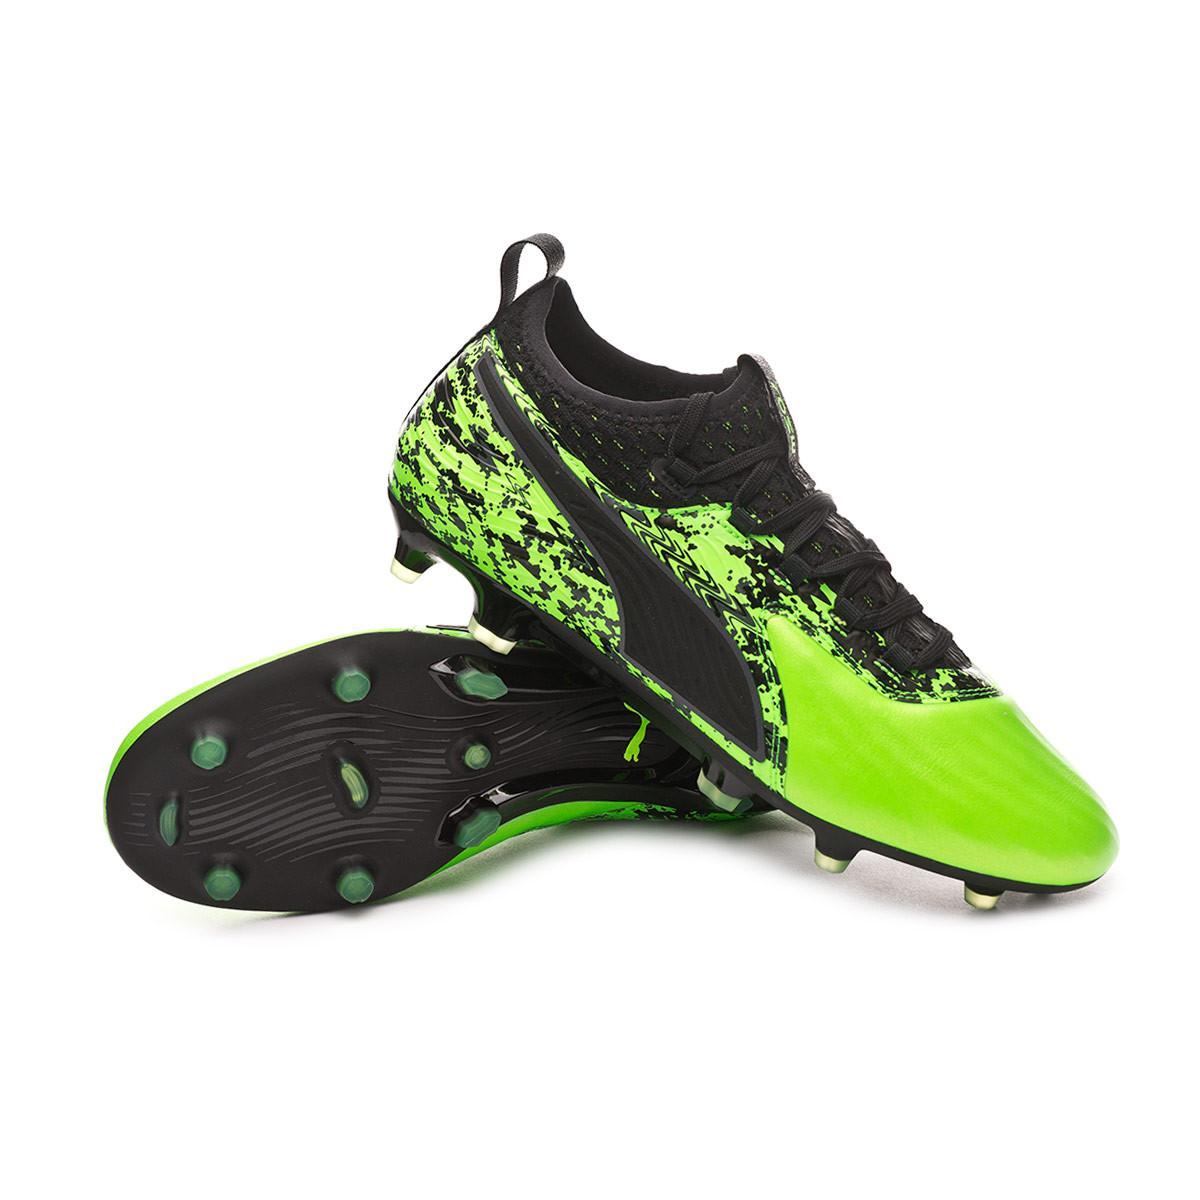 4793d50285e Football Boots Puma One 19.2 FG AG Green gecko-Puma black-Charcoal gray -  Football store Fútbol Emotion